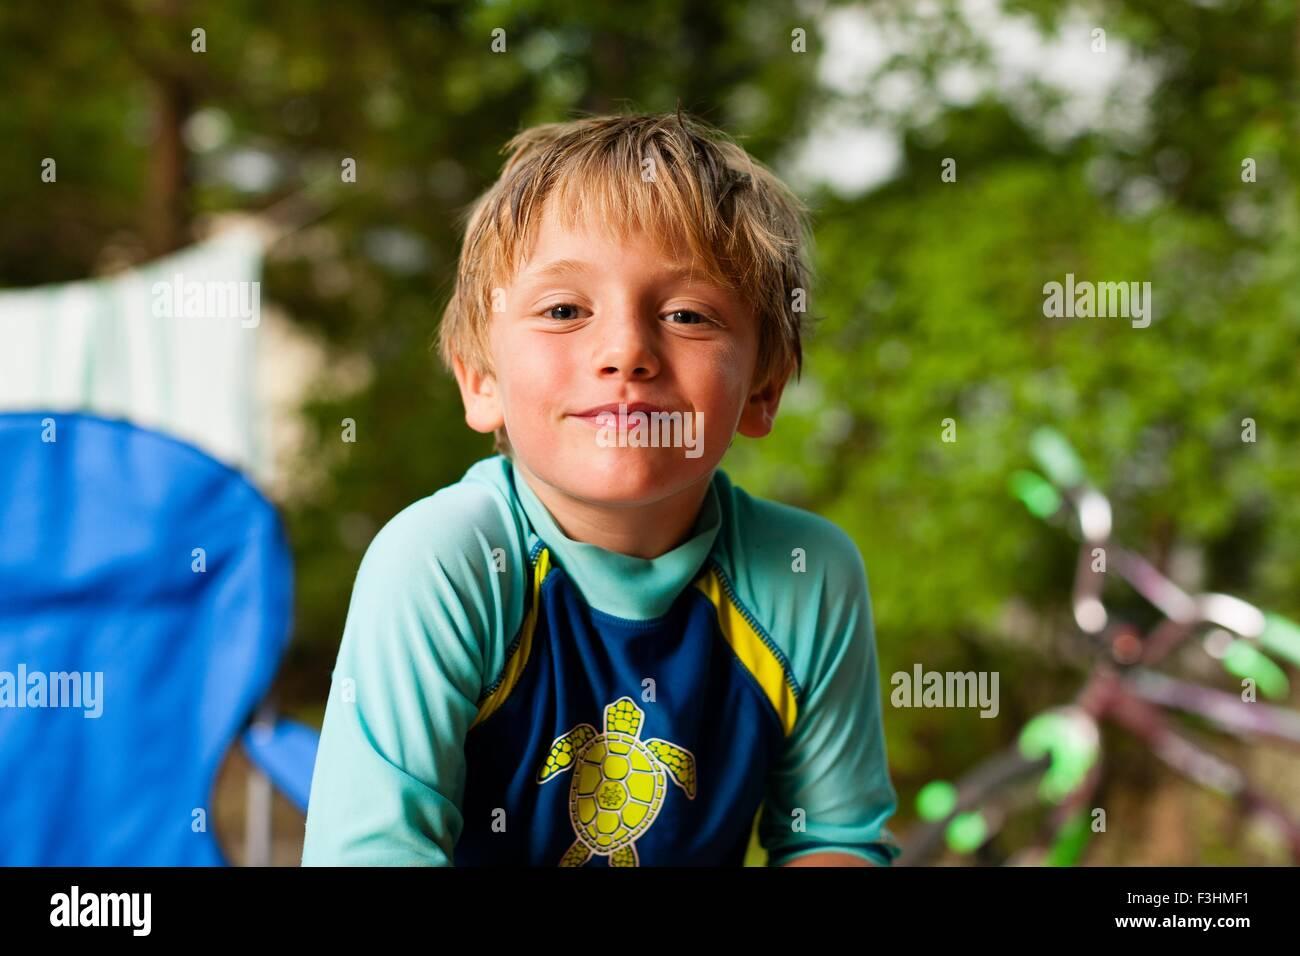 Portrait of boy wearing swimwear looking at camera smiling - Stock Image